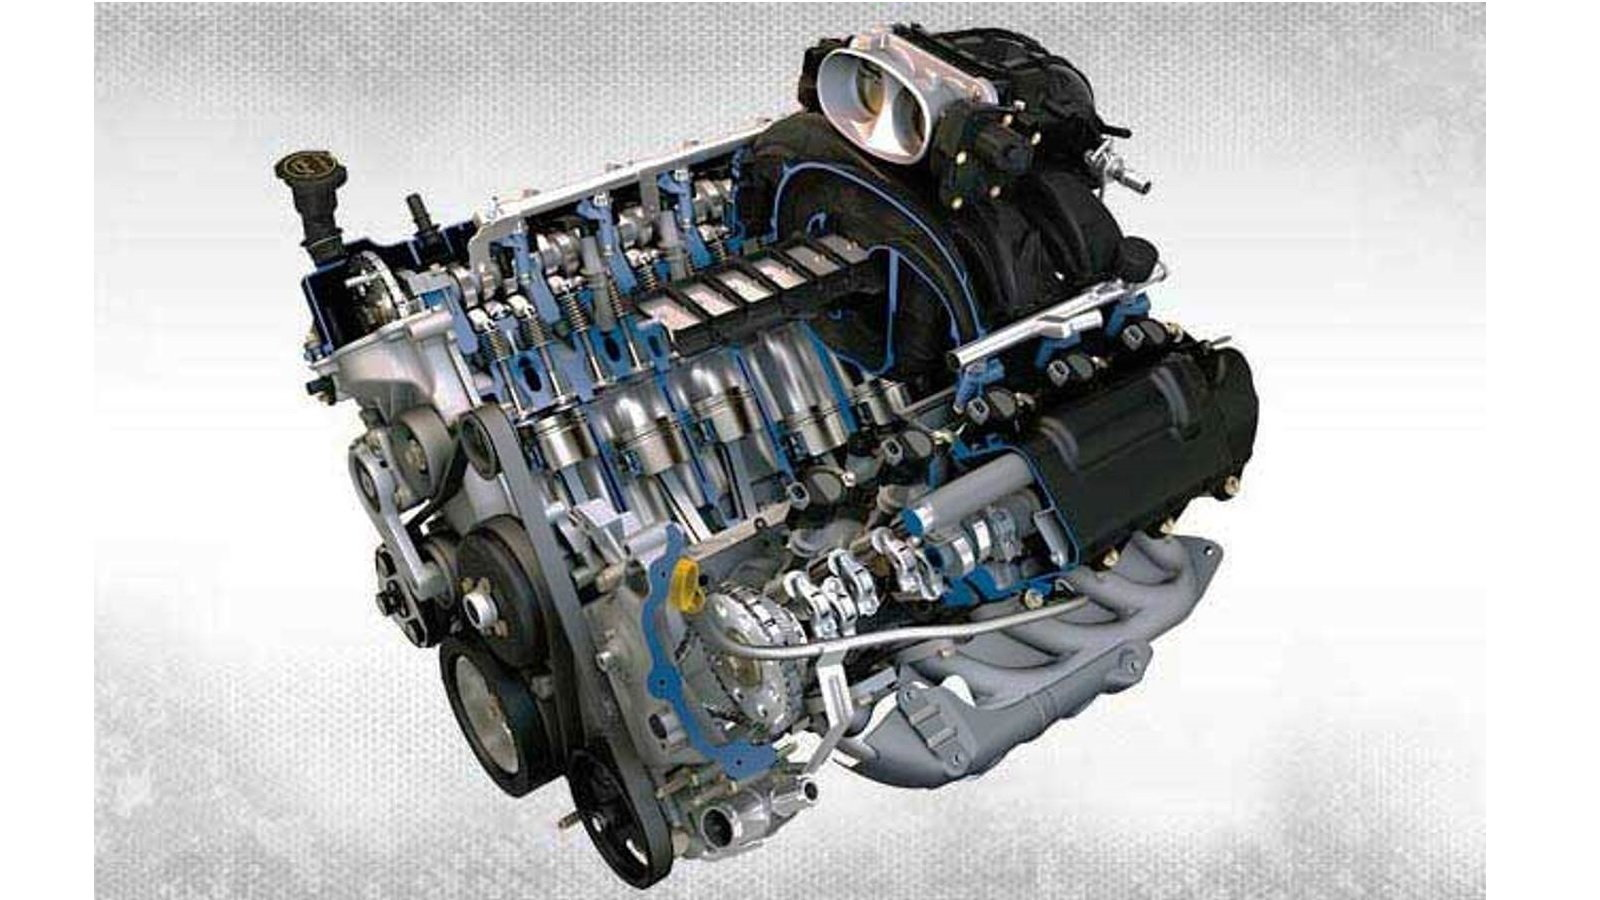 7. Ford 6.8 Liter V-10 Mod Motor